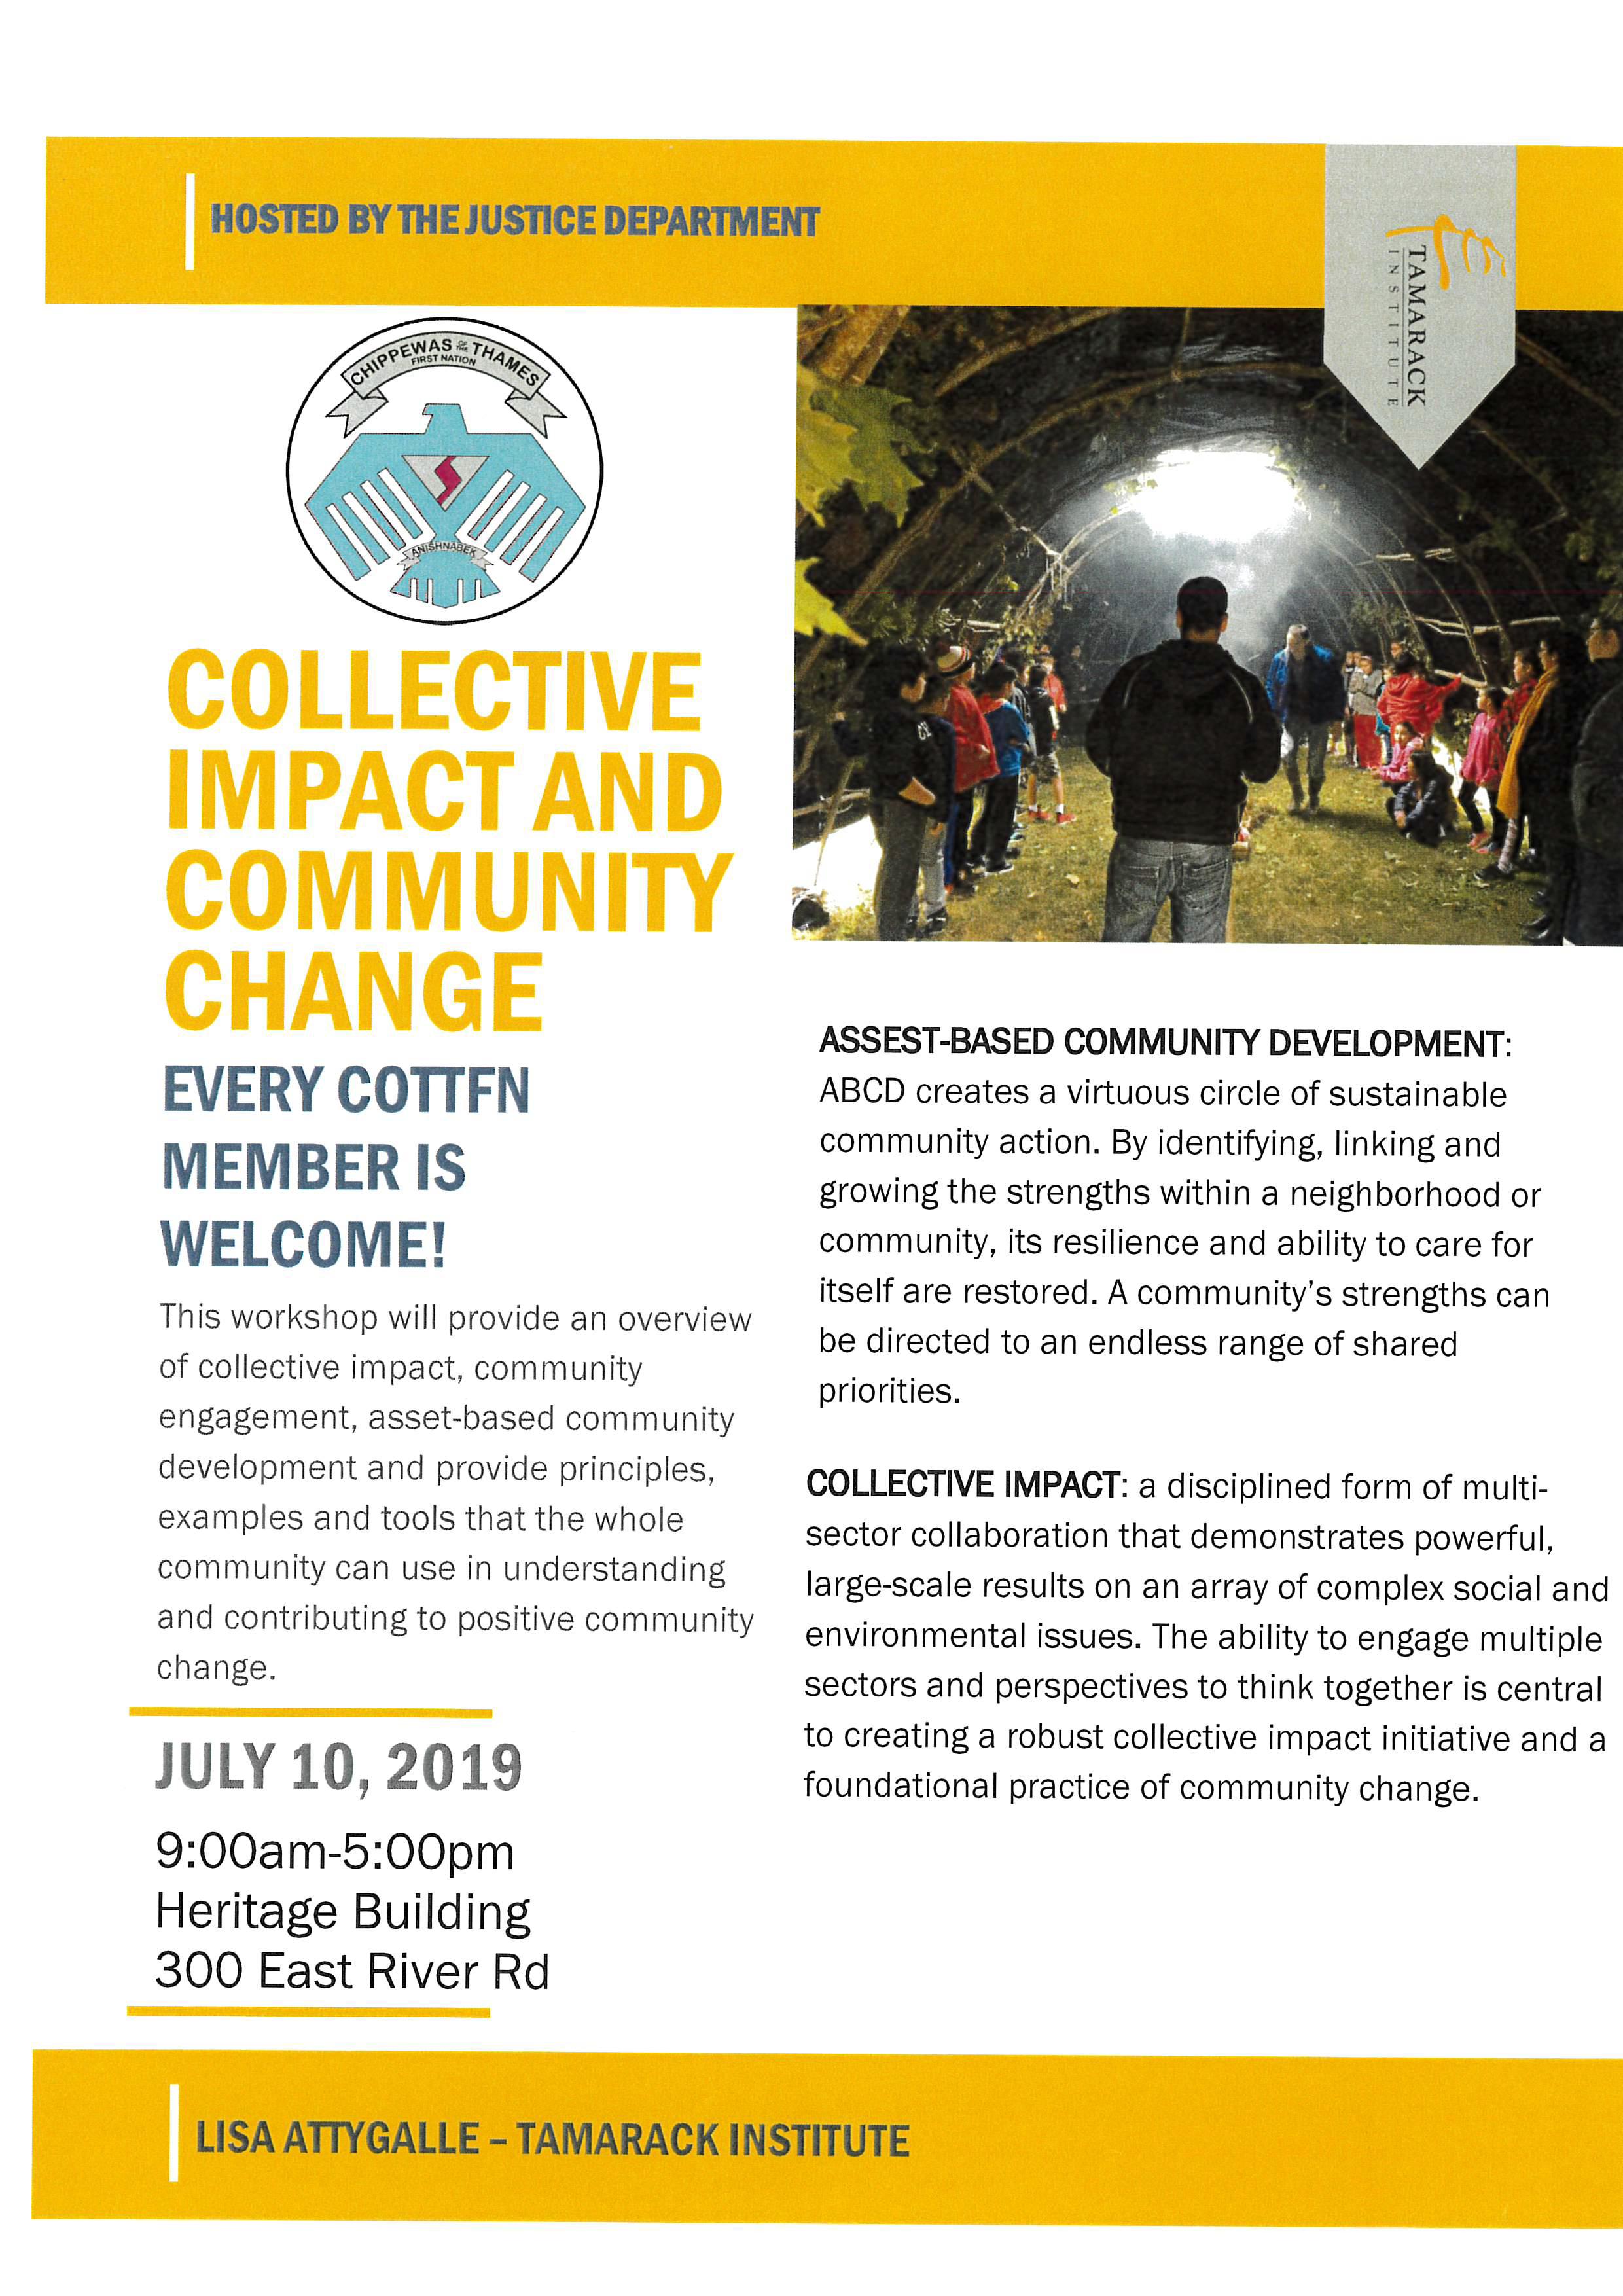 collaborative-impact-and-community-change